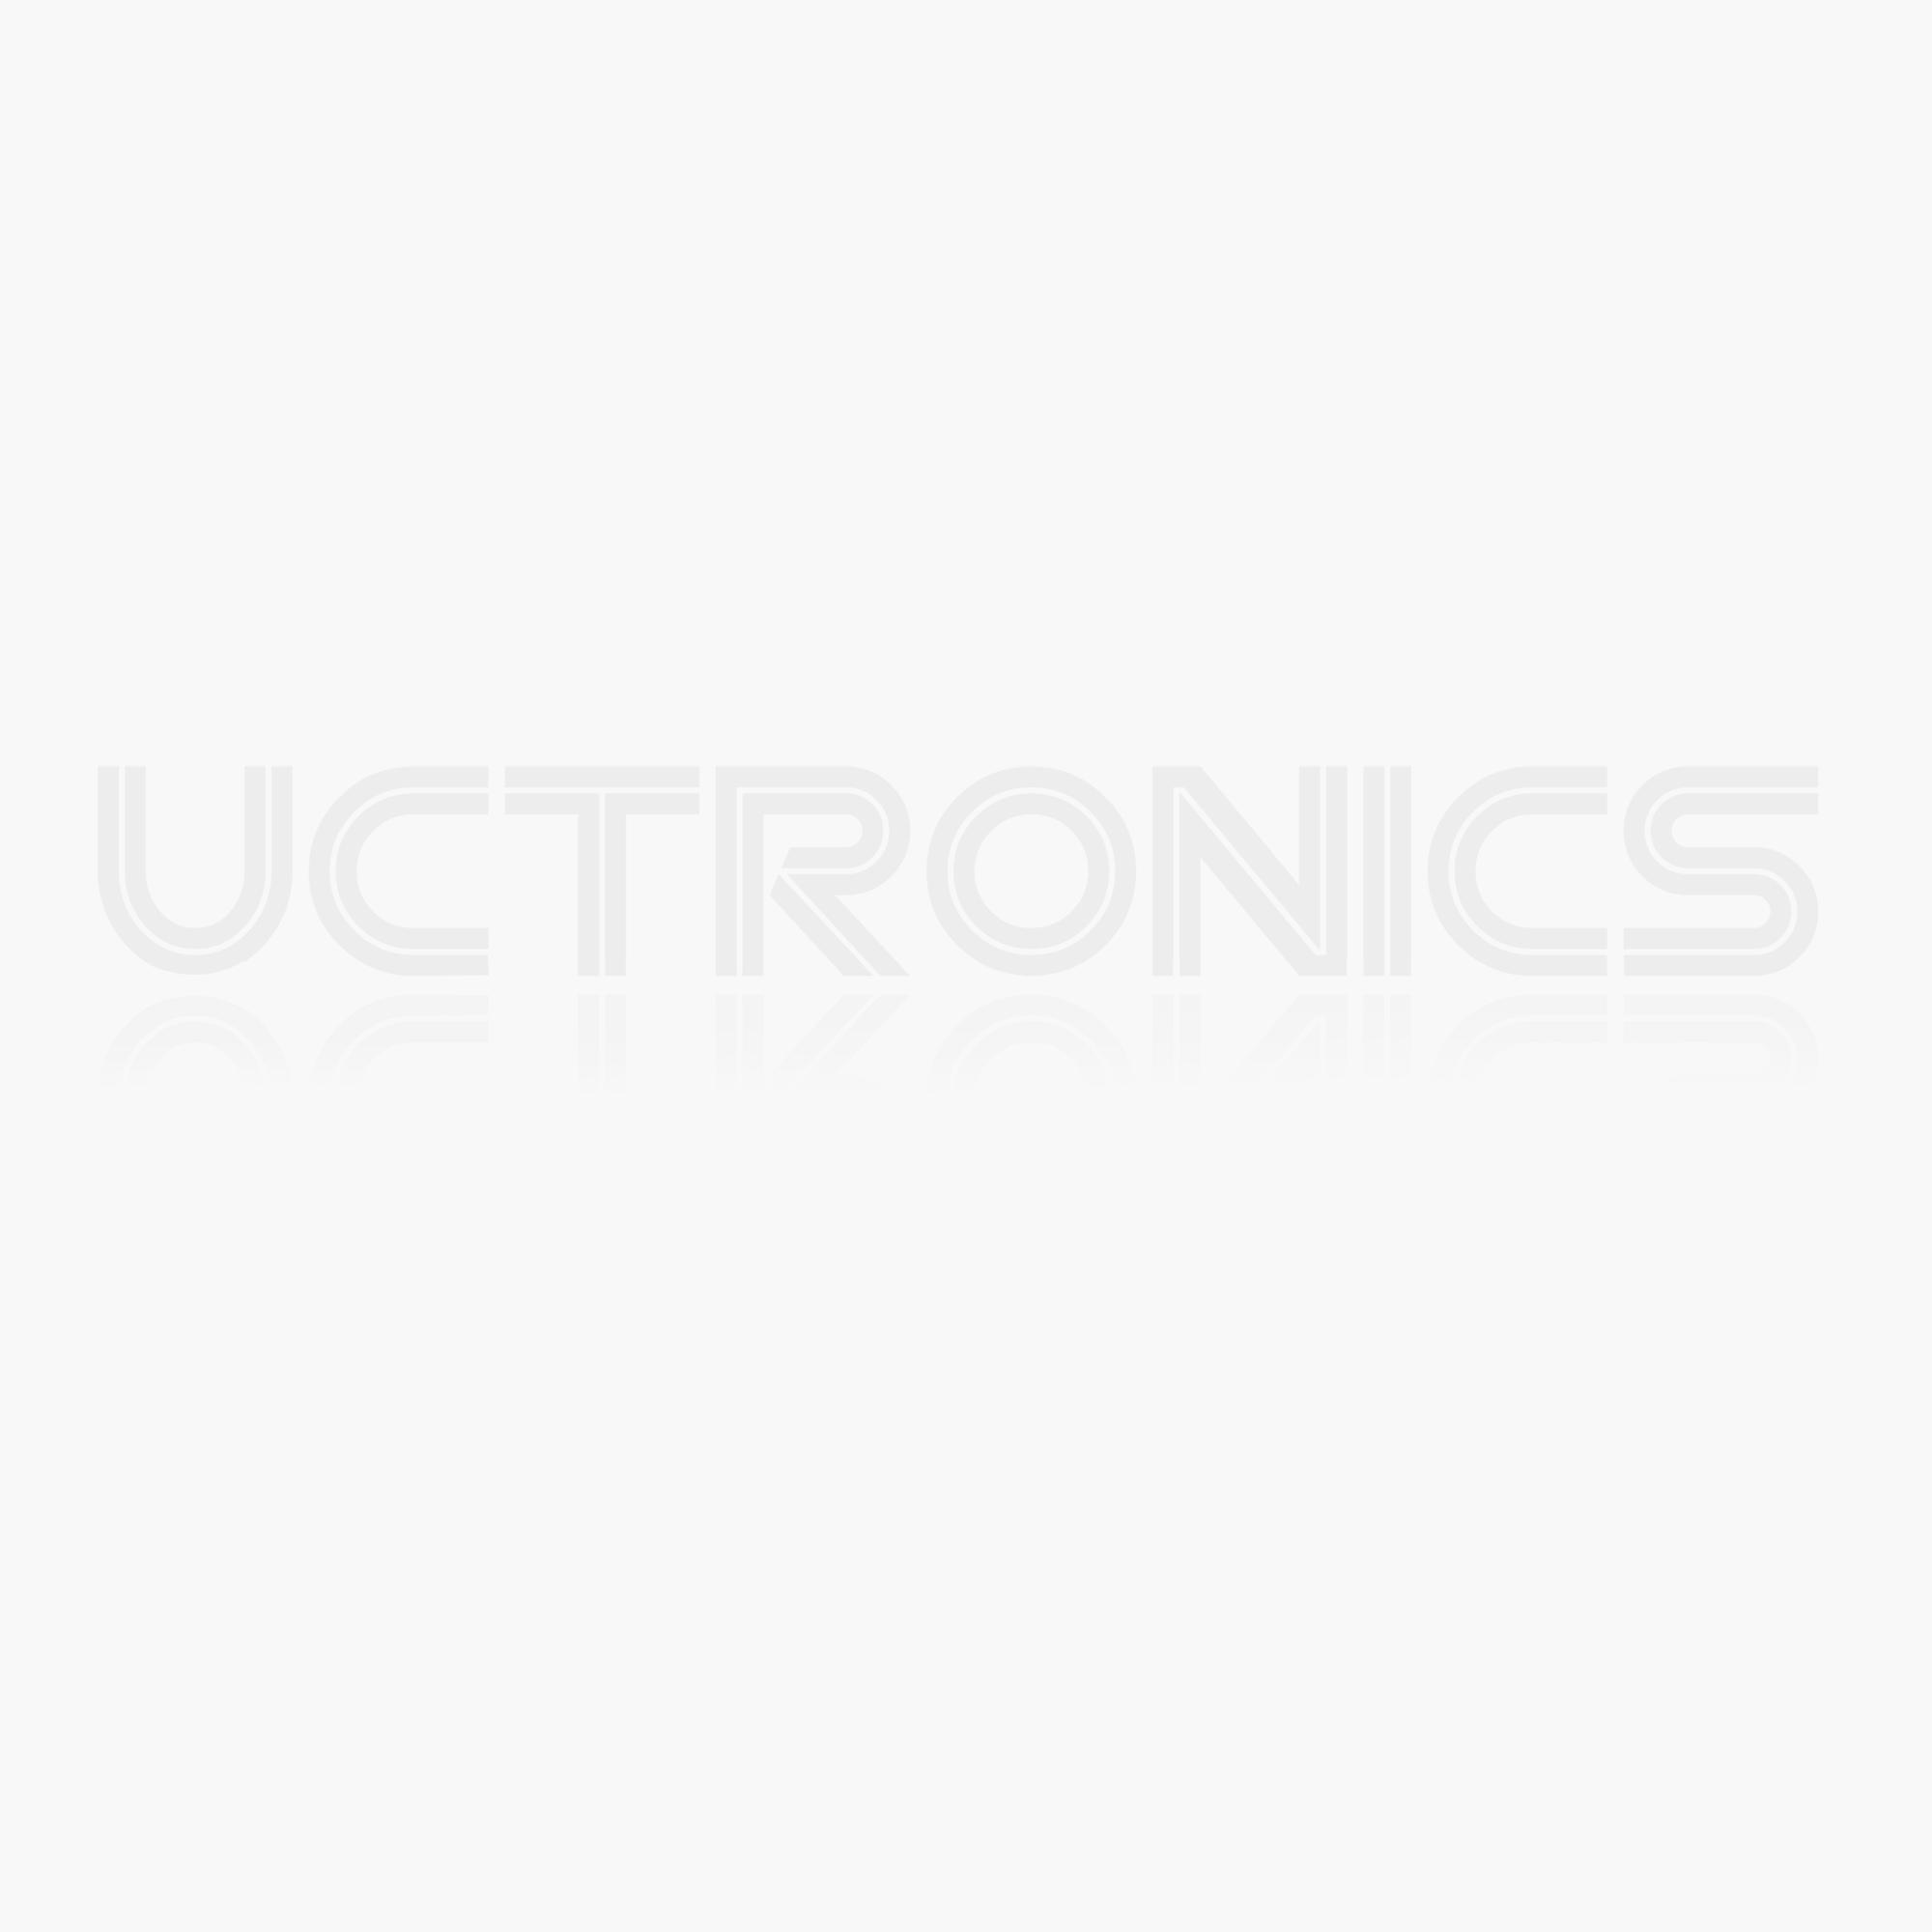 OV2640 2.0 MP Mega Pixels 1/4'' CMOS image sensor SCCB interface Camera module